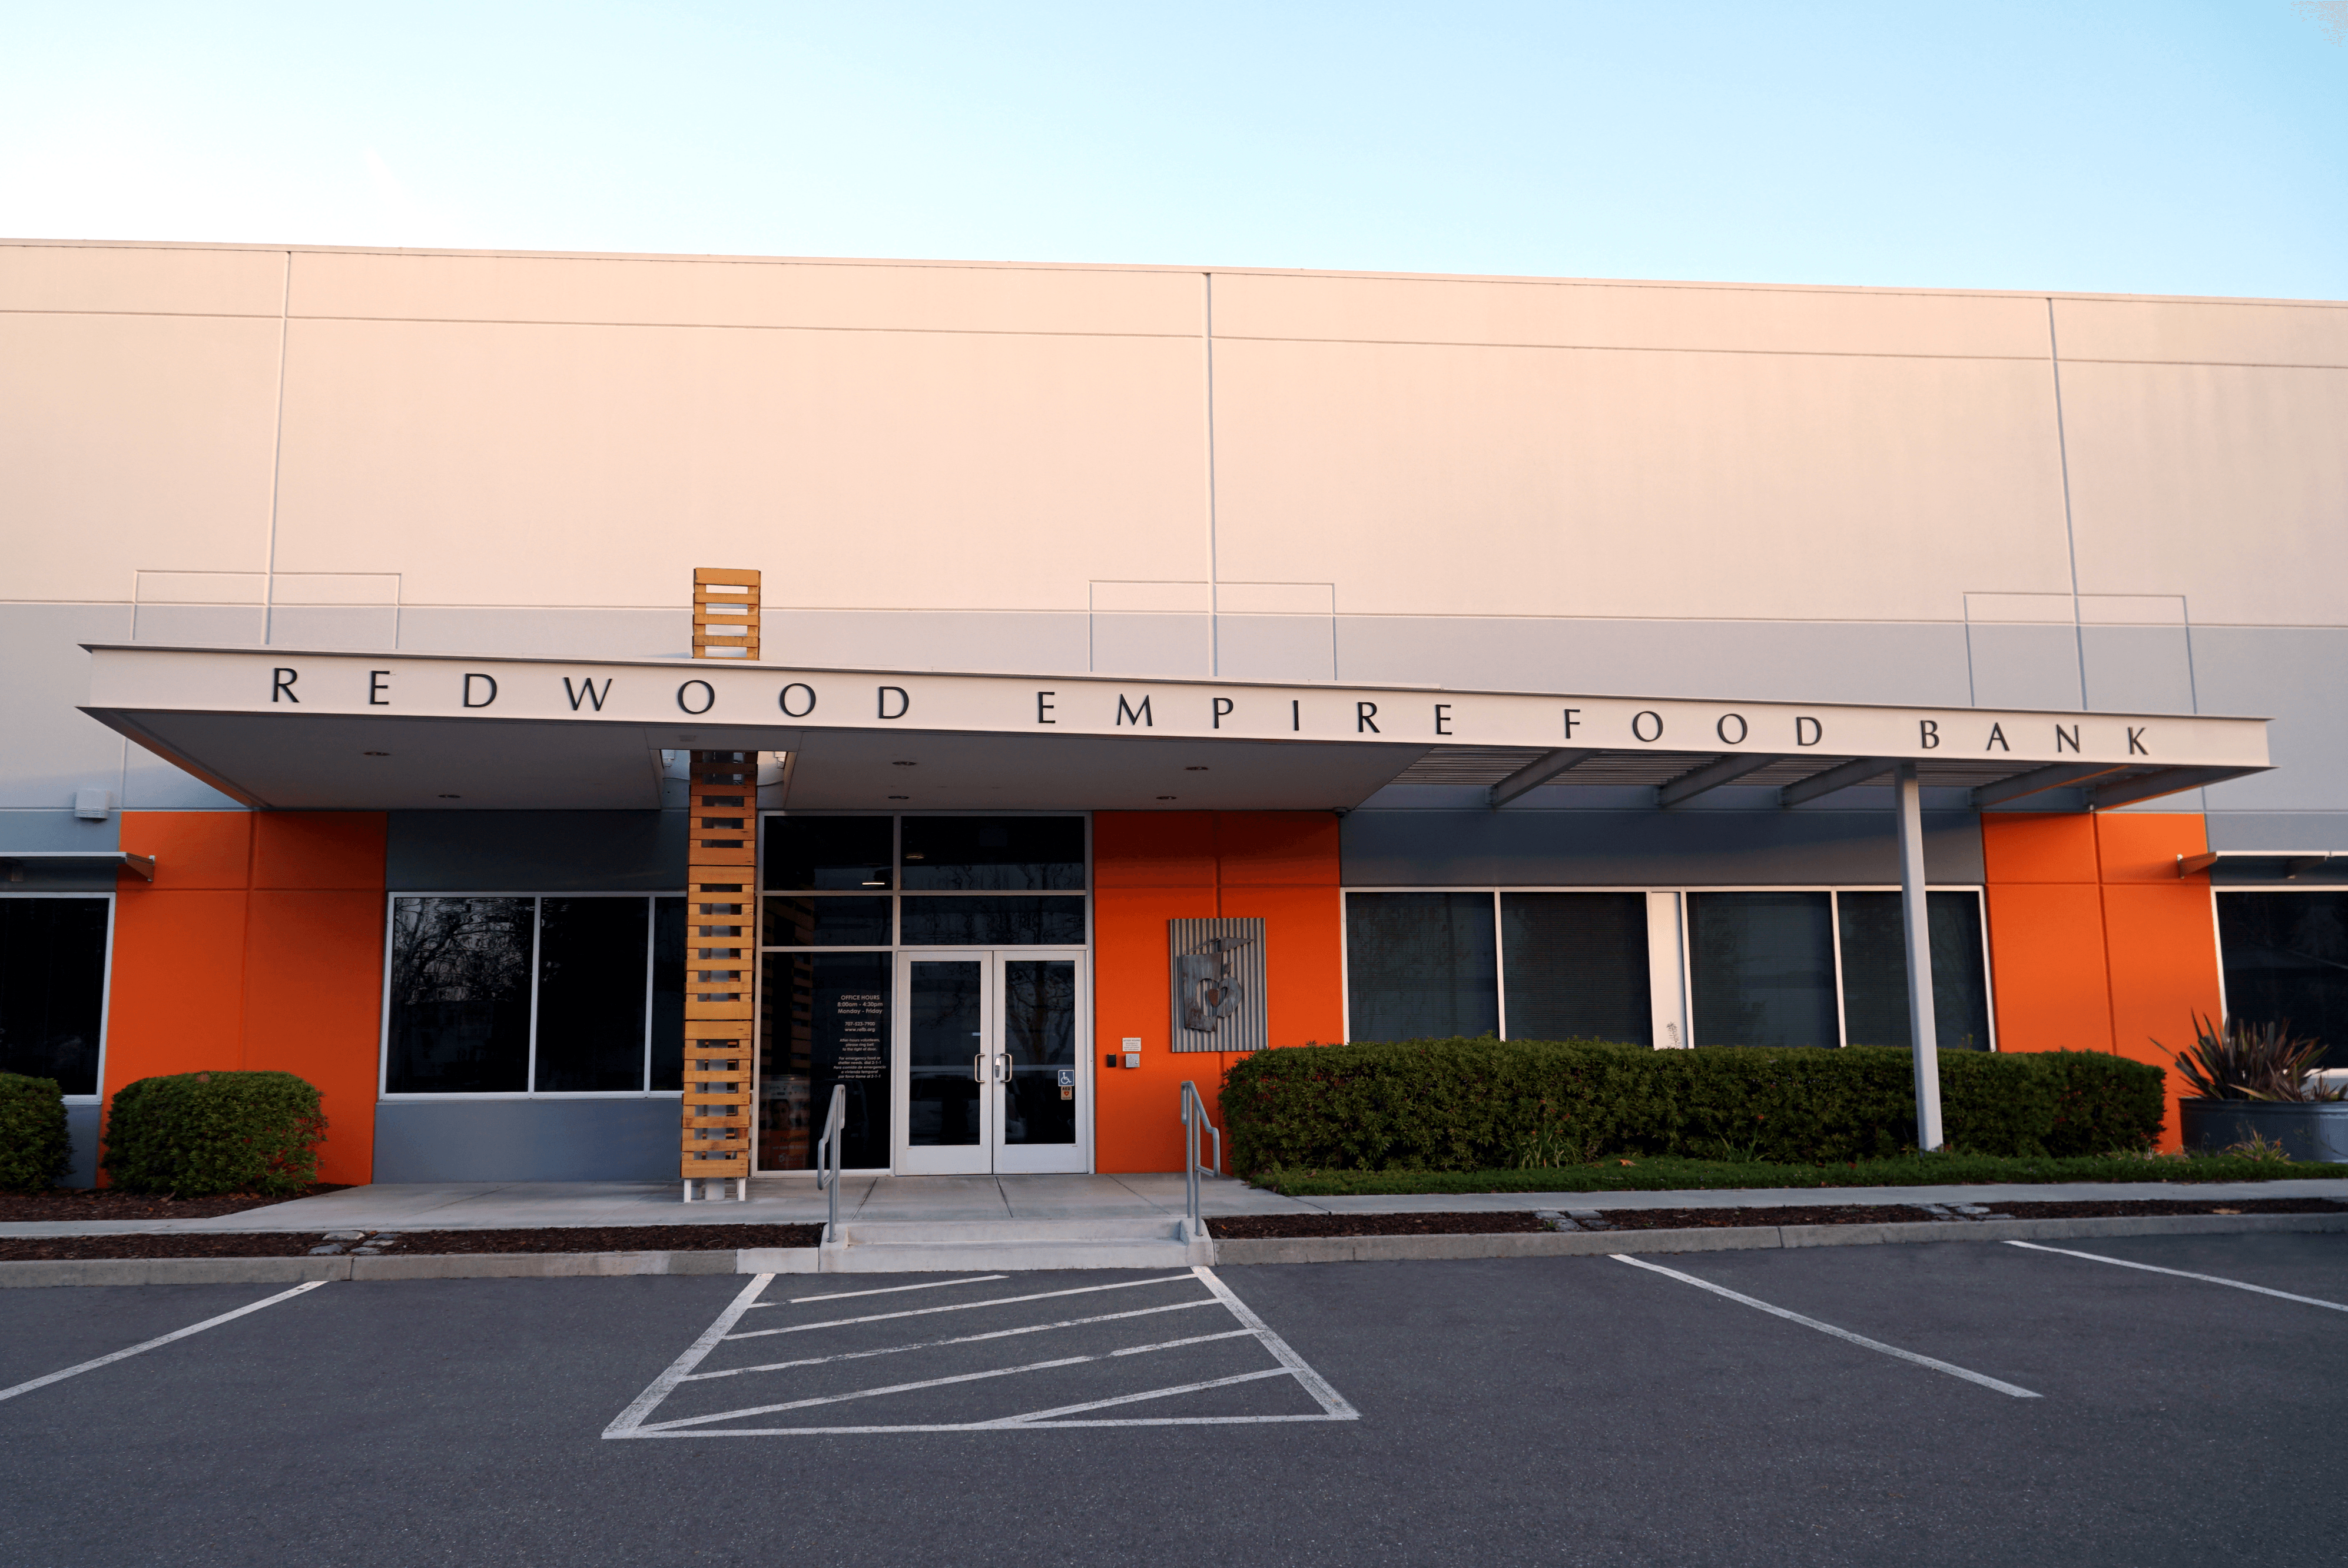 Redwood Empire Food Bank Partnership